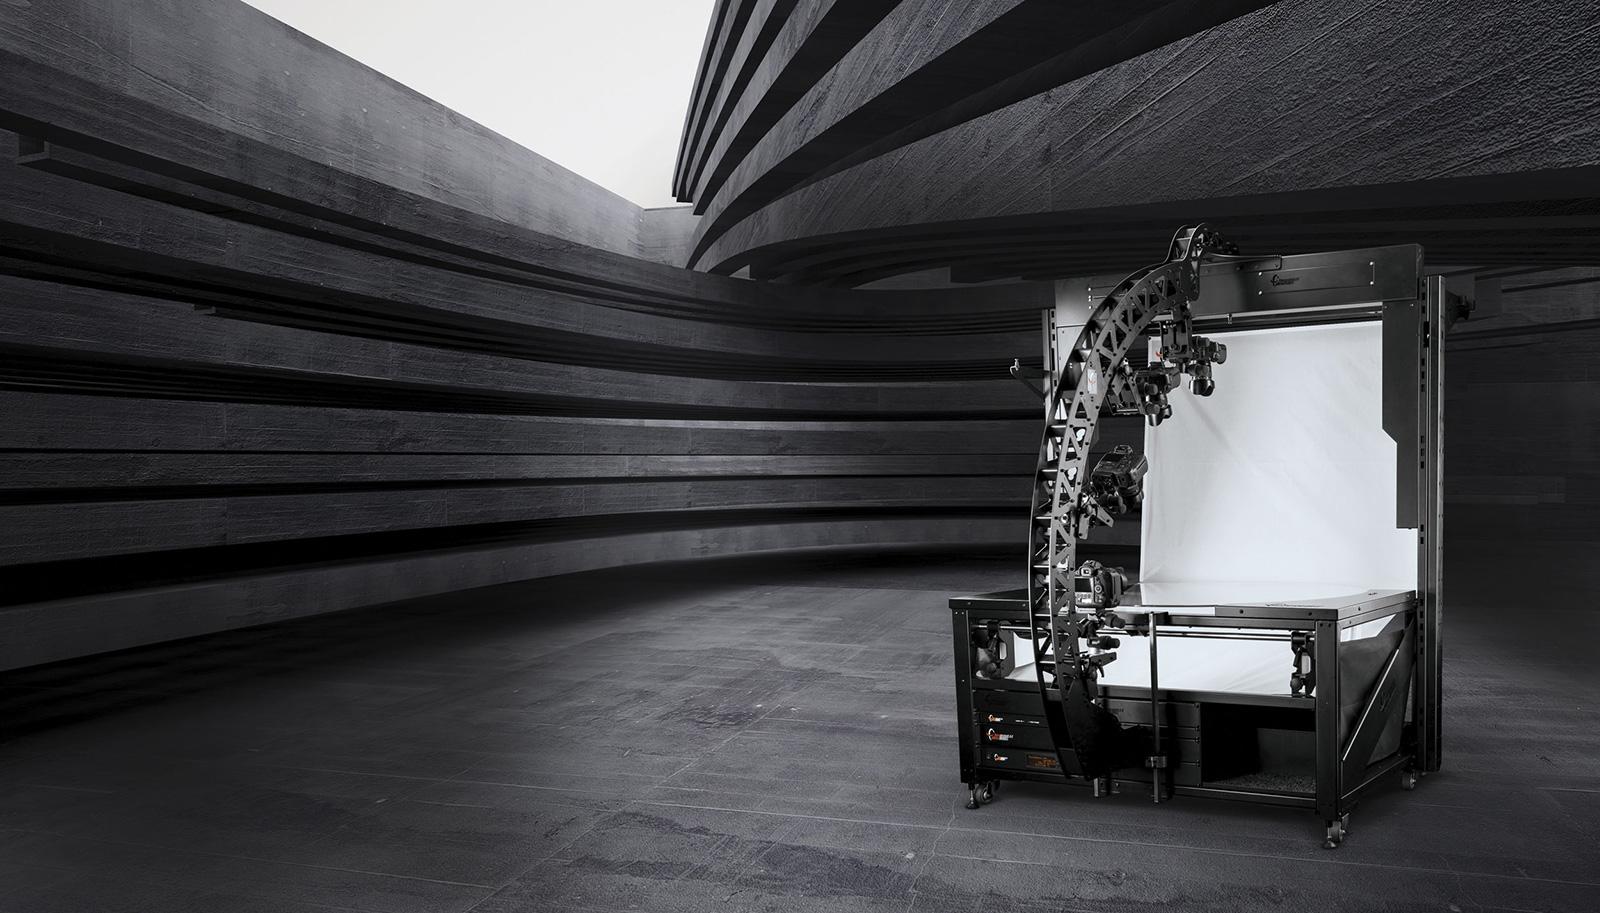 PhotoRobot الروبوتيه TURNTABLE مع MULTICAM ذراع الكاميرا الروبوتية